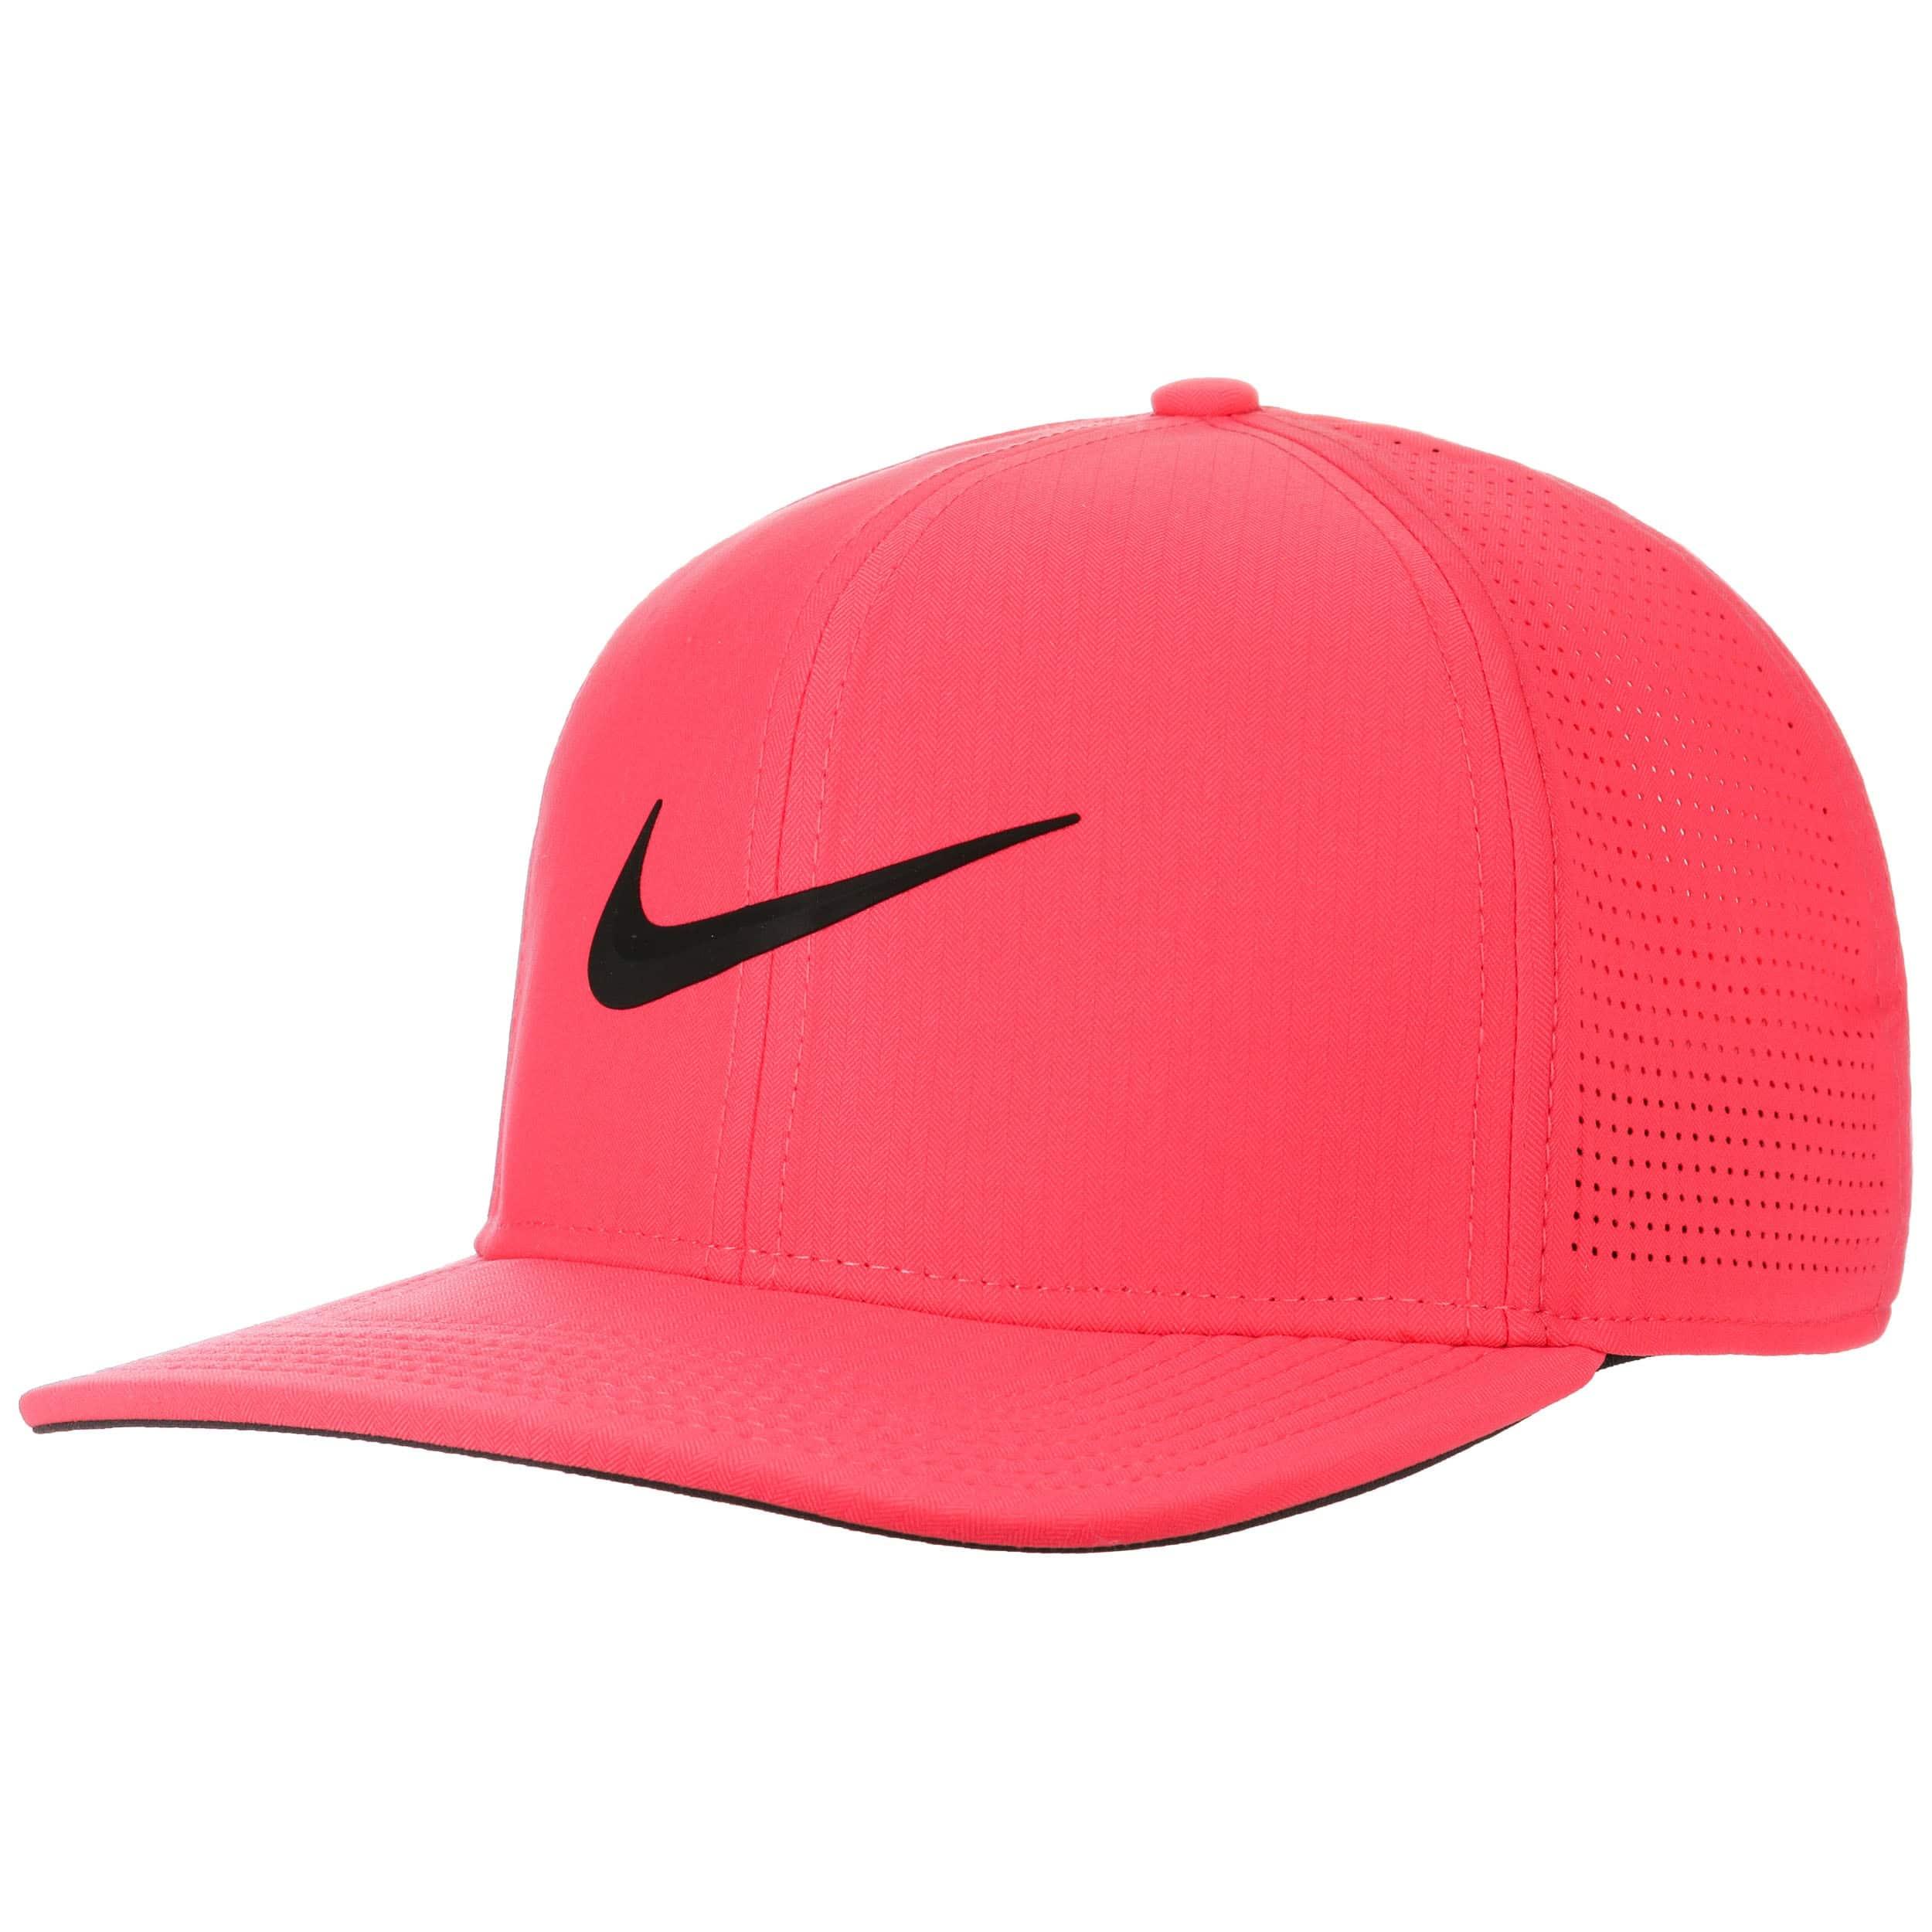 662a0cb9 Aerobill Golf Cap by Nike, GBP 30,95 --> Hats, caps & beanies shop ...